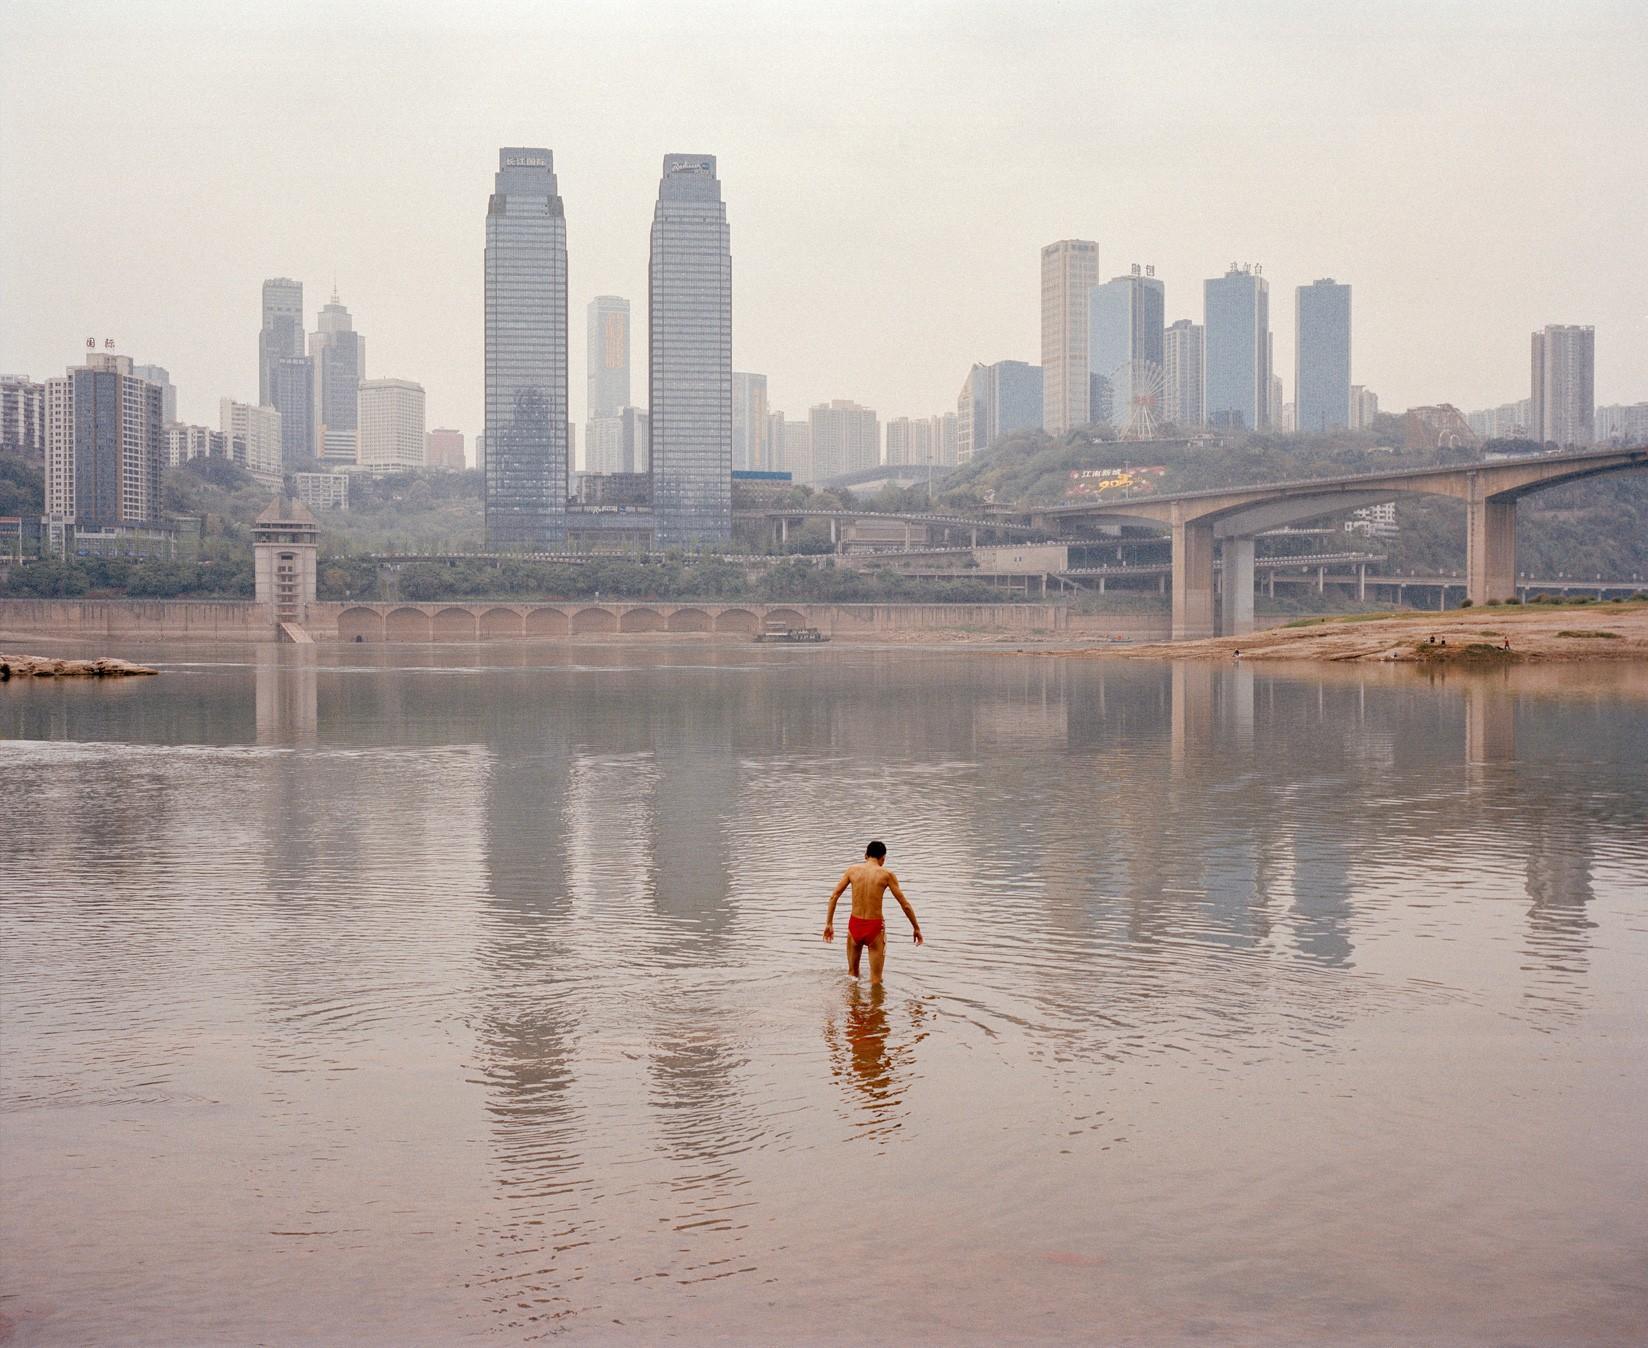 Тут вода целая проблема: 10 стран в фото-подборке